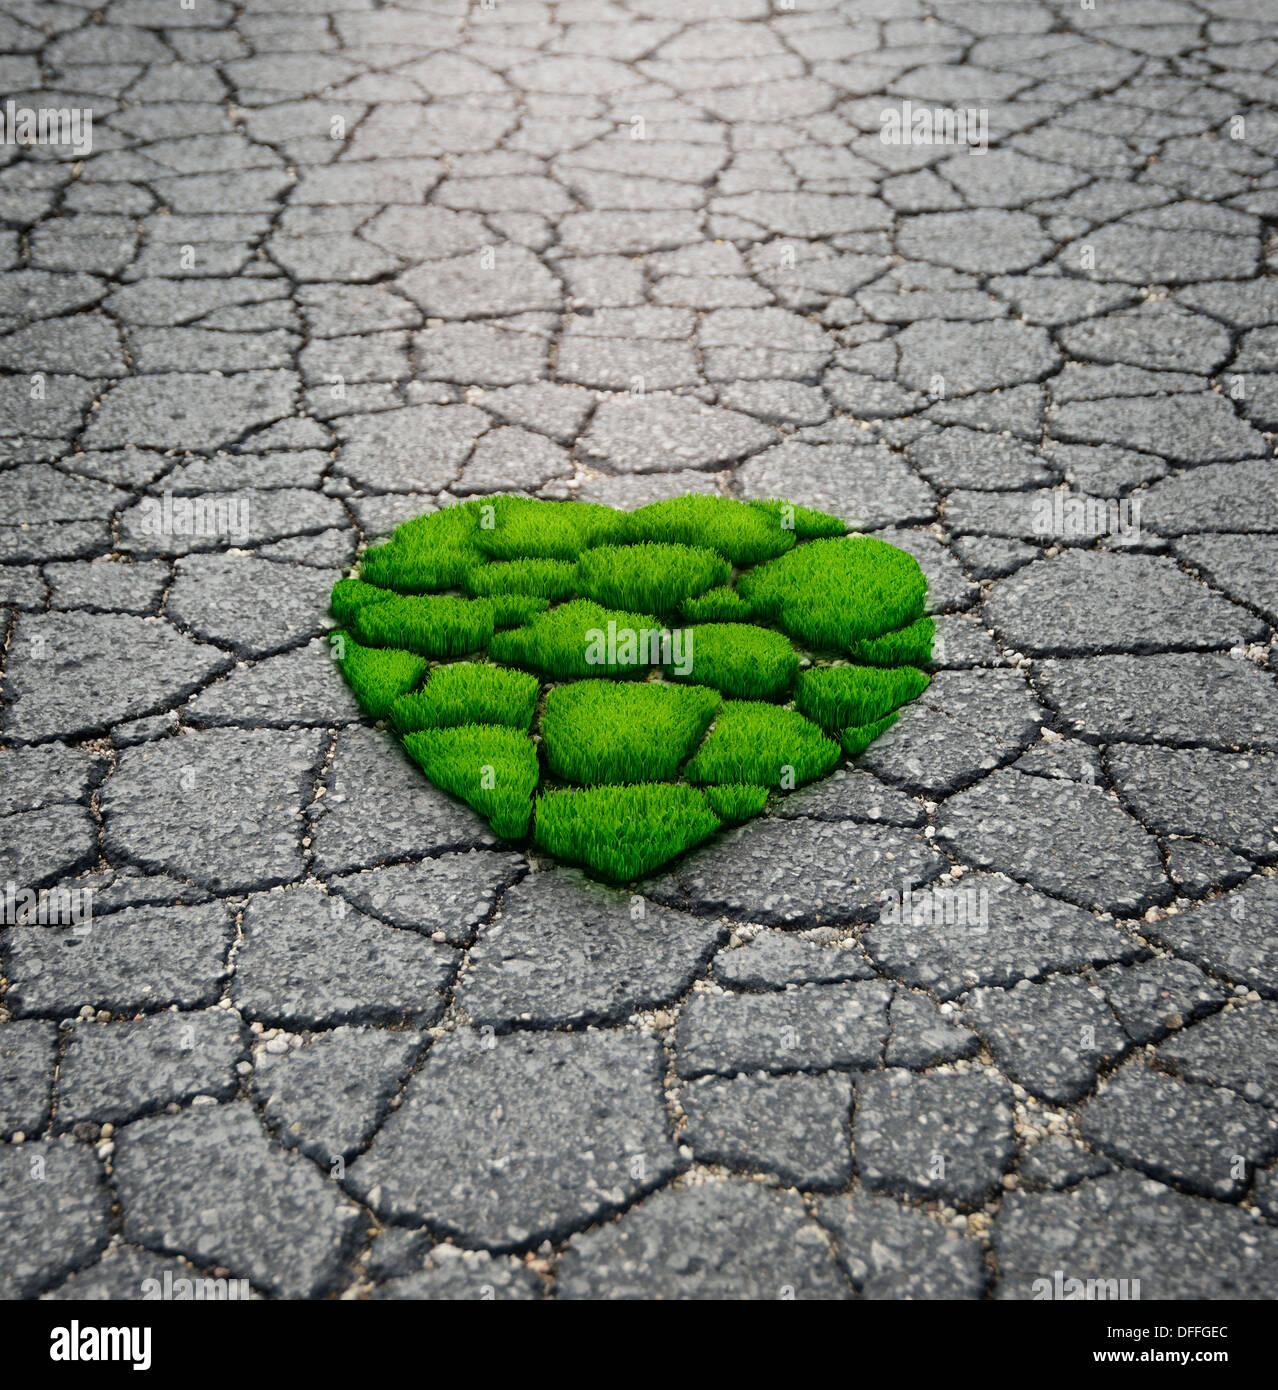 Heart Shape césped que crece desde el asfalto Imagen De Stock